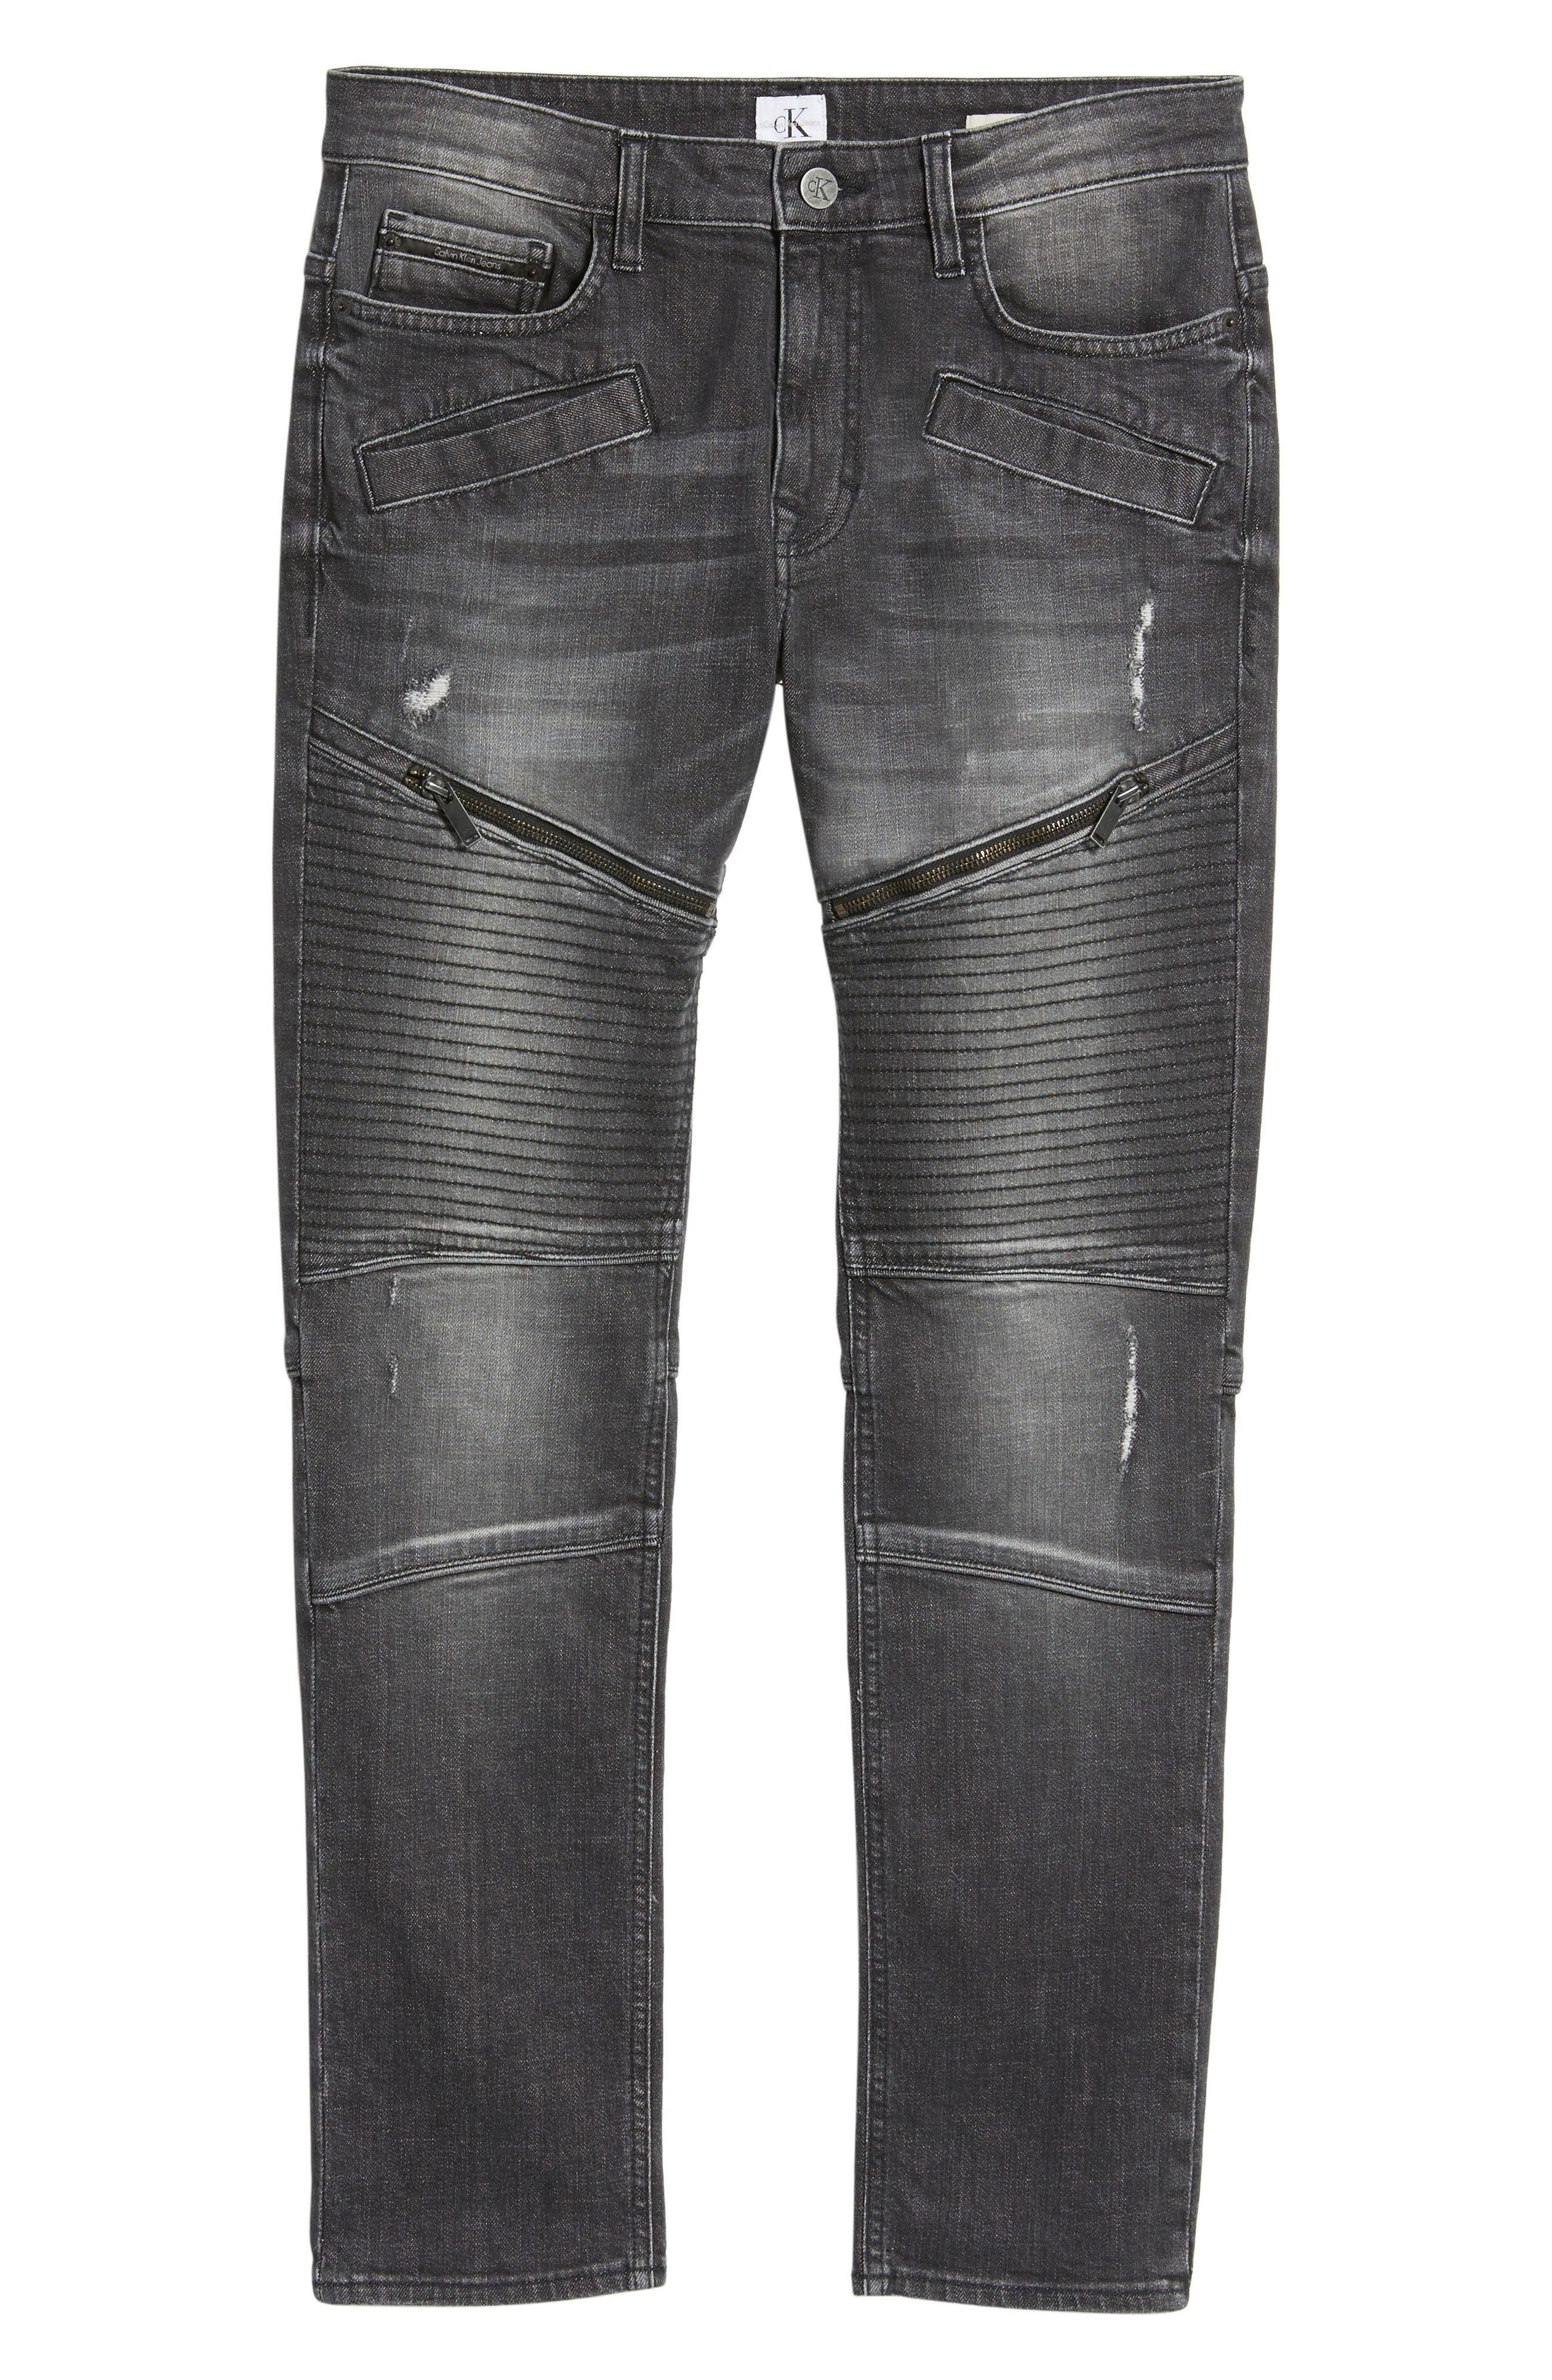 Biker Denim Jeans,                             Alternate thumbnail 6, color,                             Black